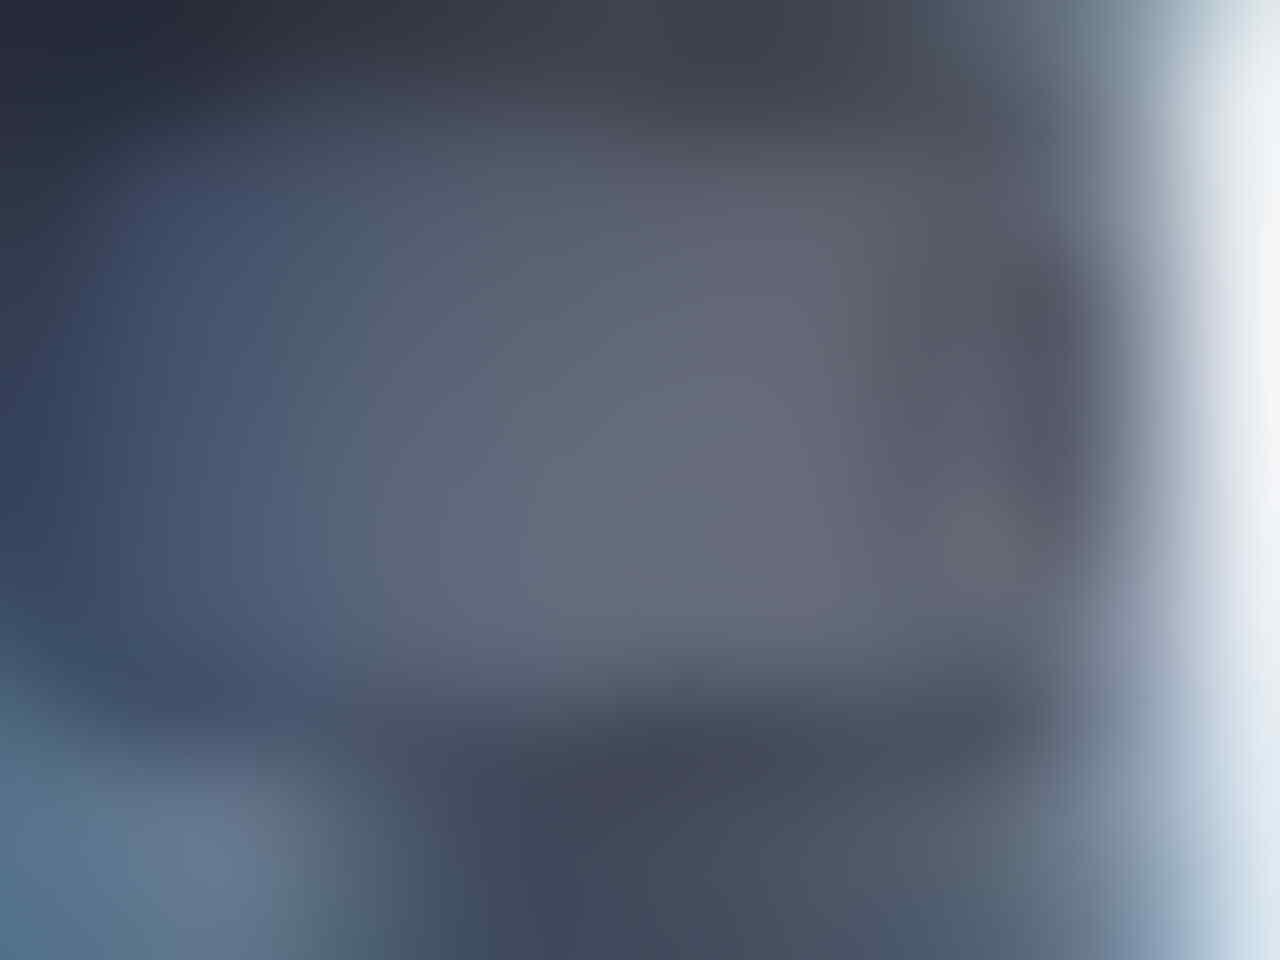 WTS >> ONYX 3 9790 BELAGIO BLACK MULUSSS 14 BLN BERINDO 2,3JT NEGOOO